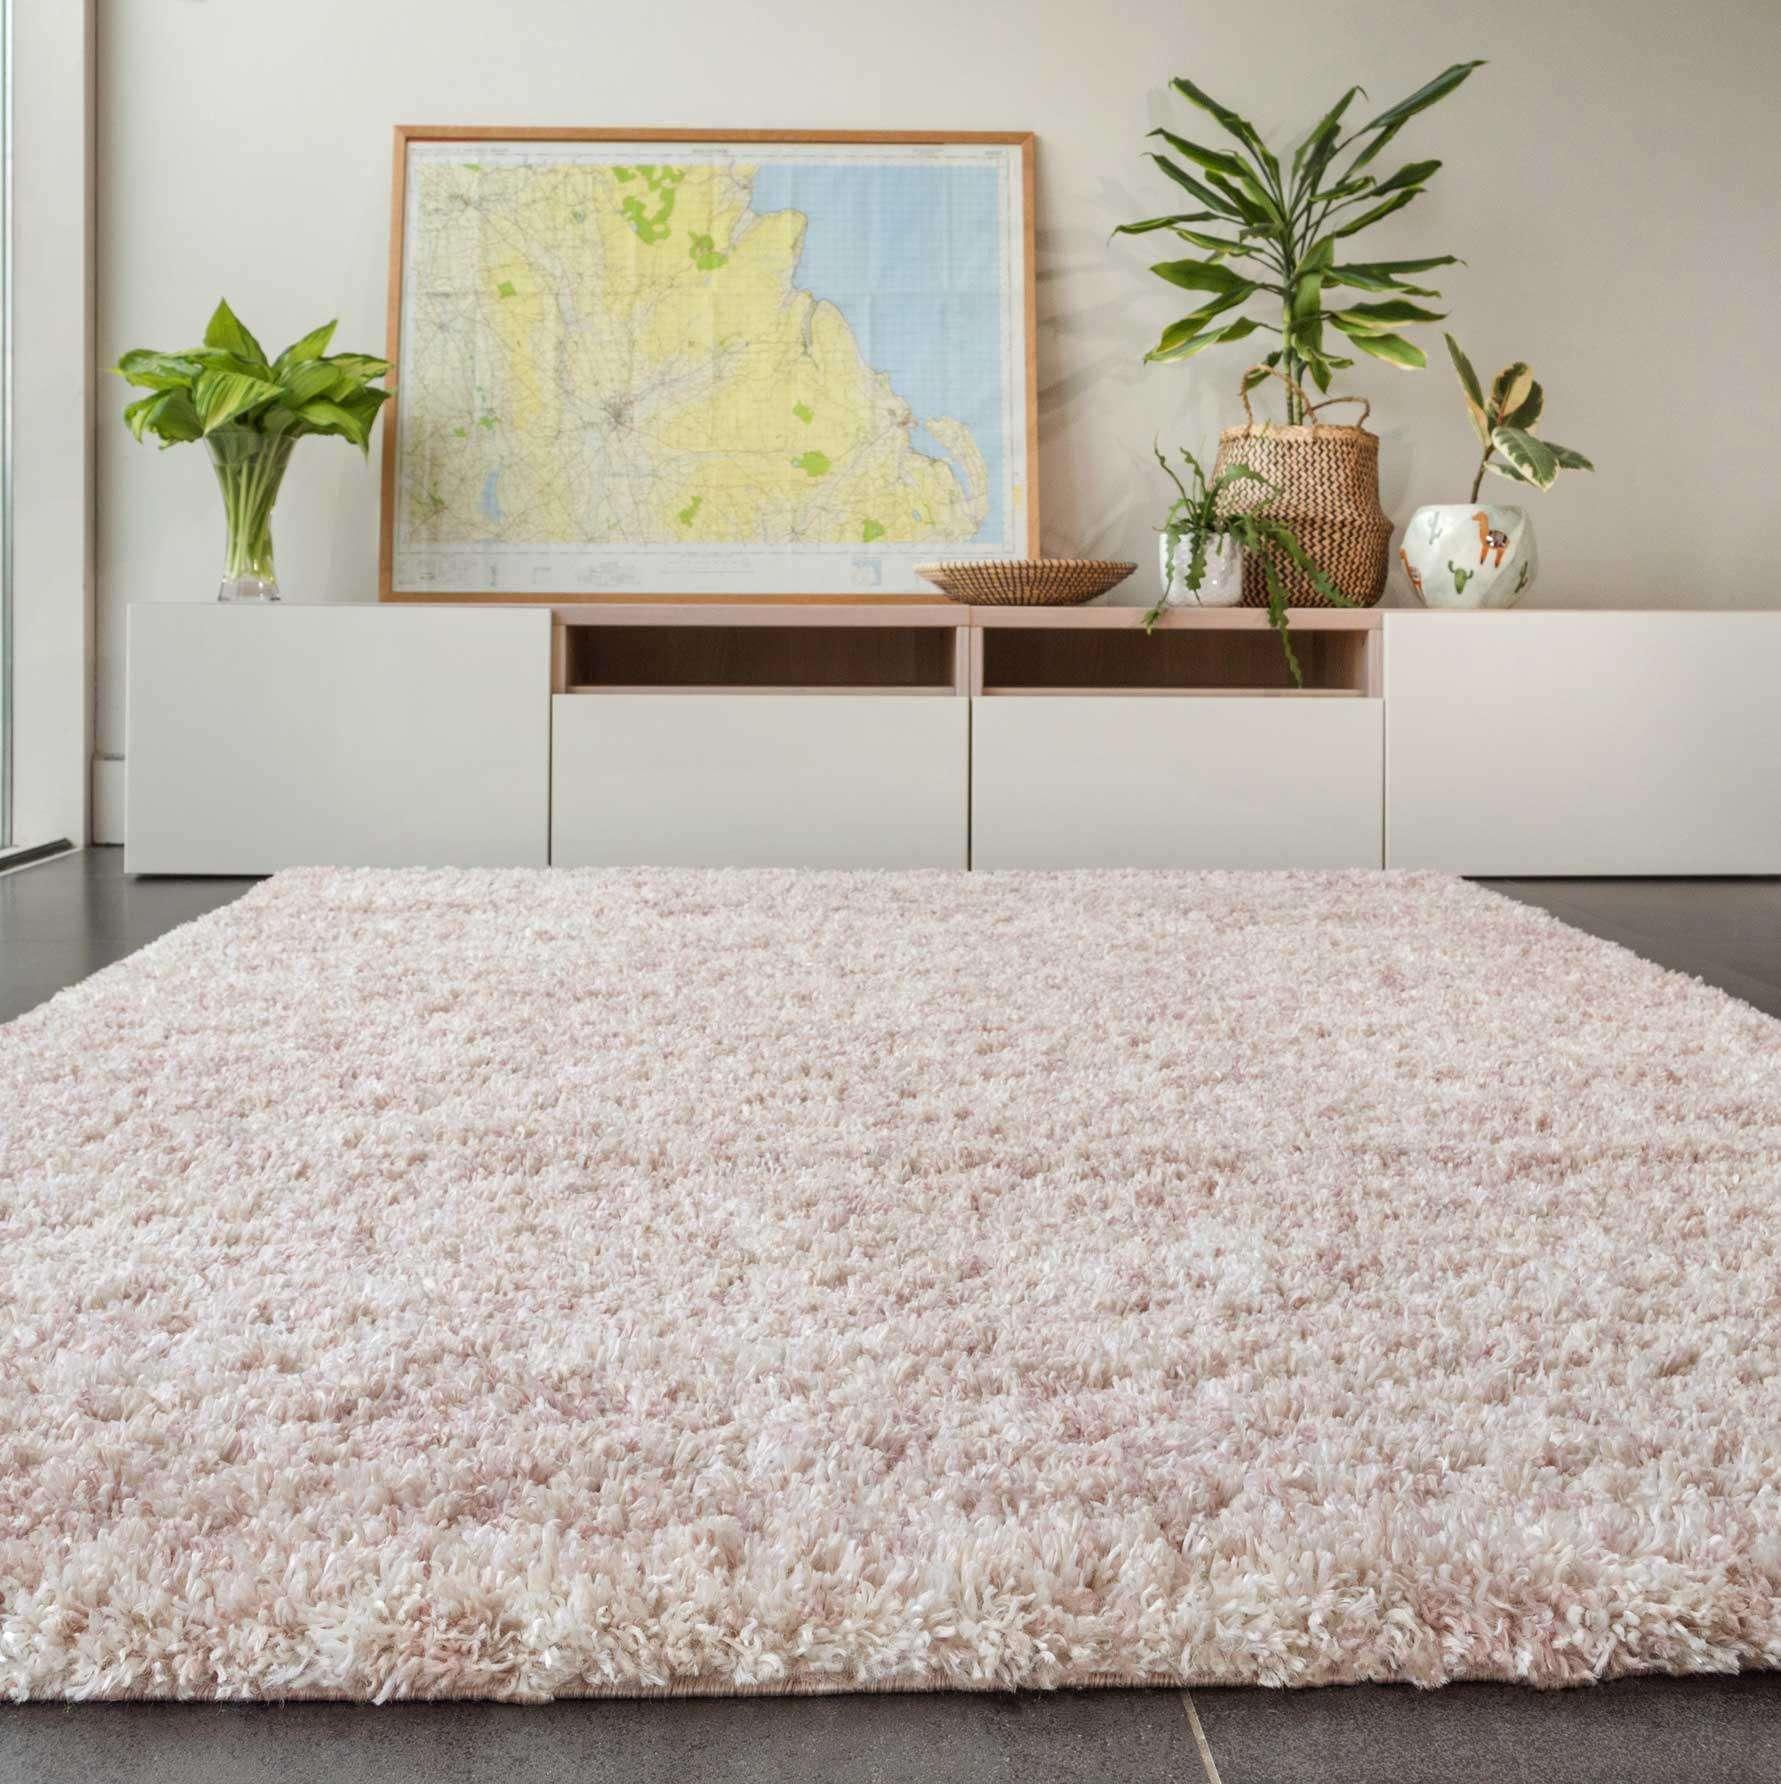 Soft Mottled Light Pink Shaggy Area Rug | Camberley